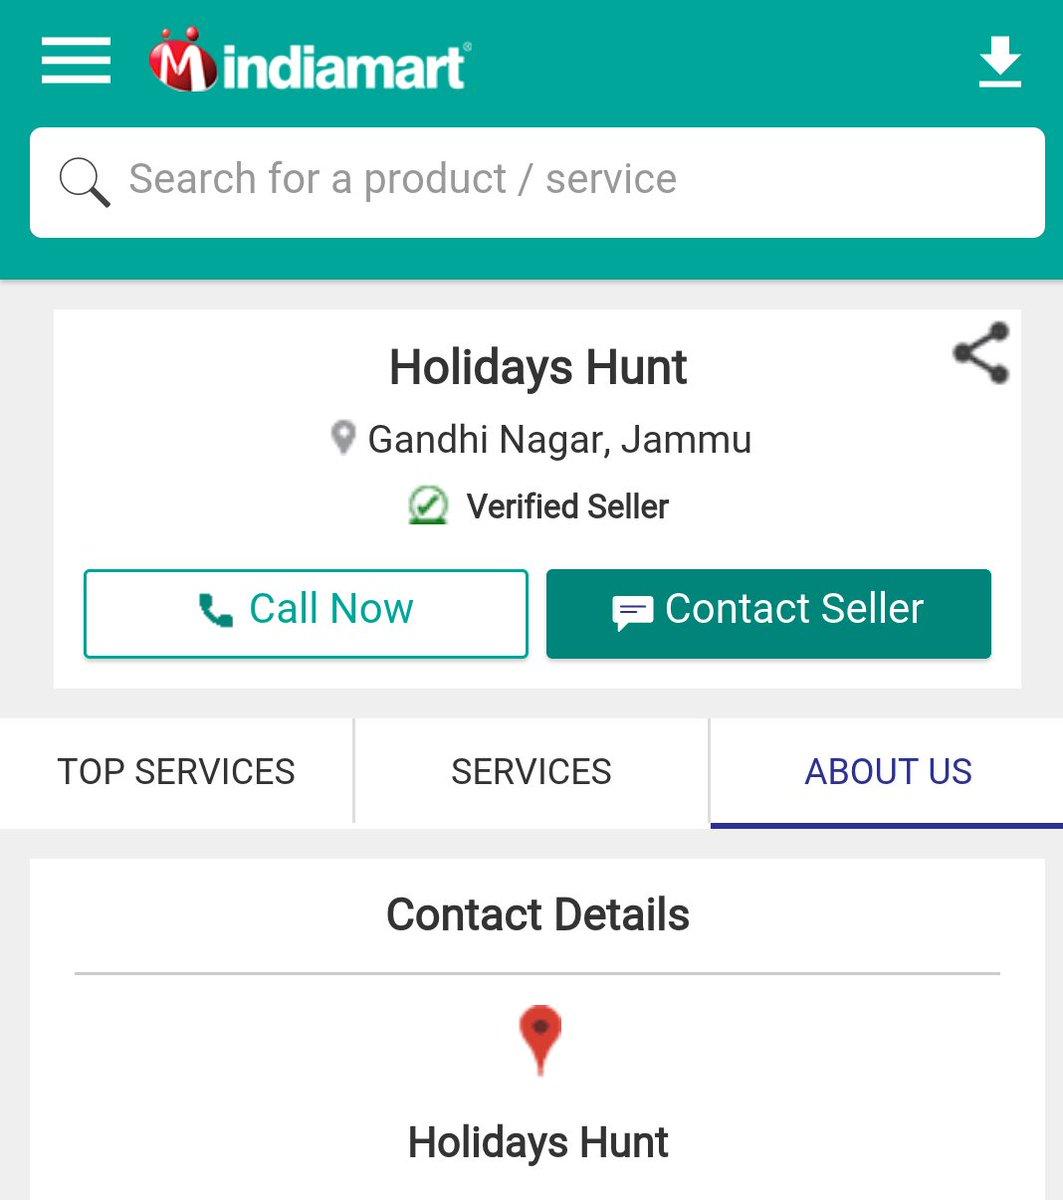 One travel company